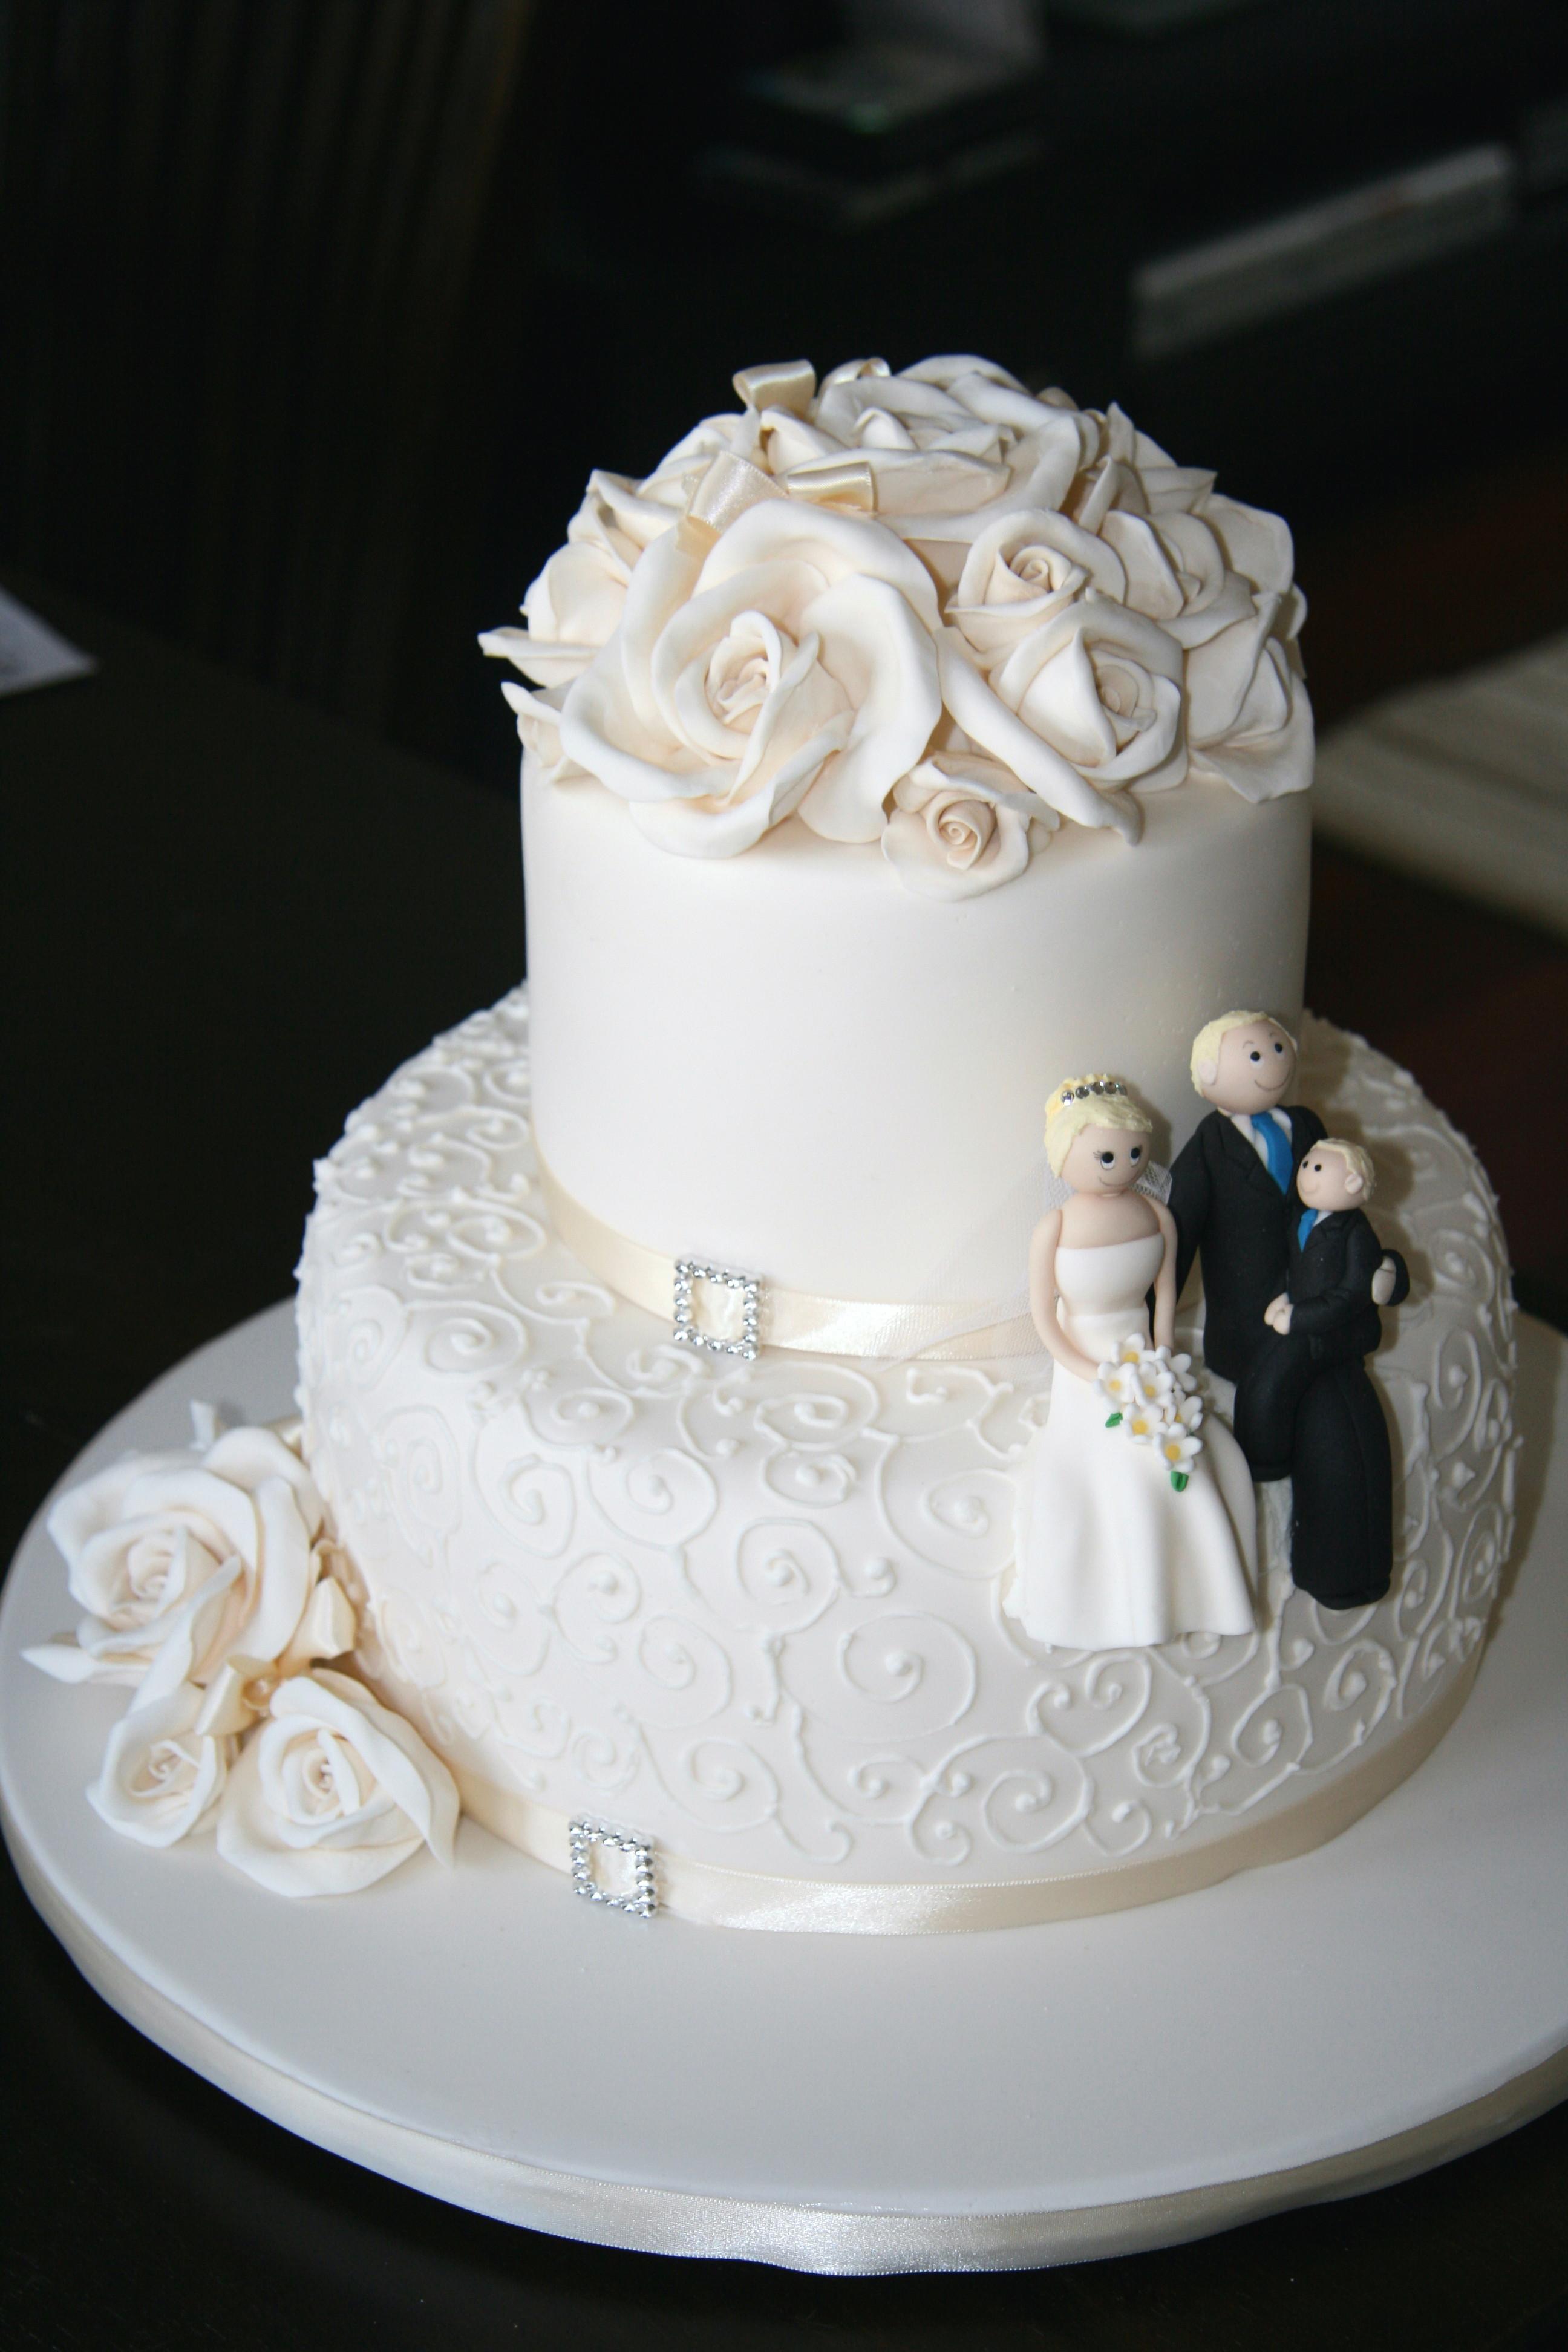 Wedding Cakes Tiered  2 tier wedding cake ideas idea in 2017